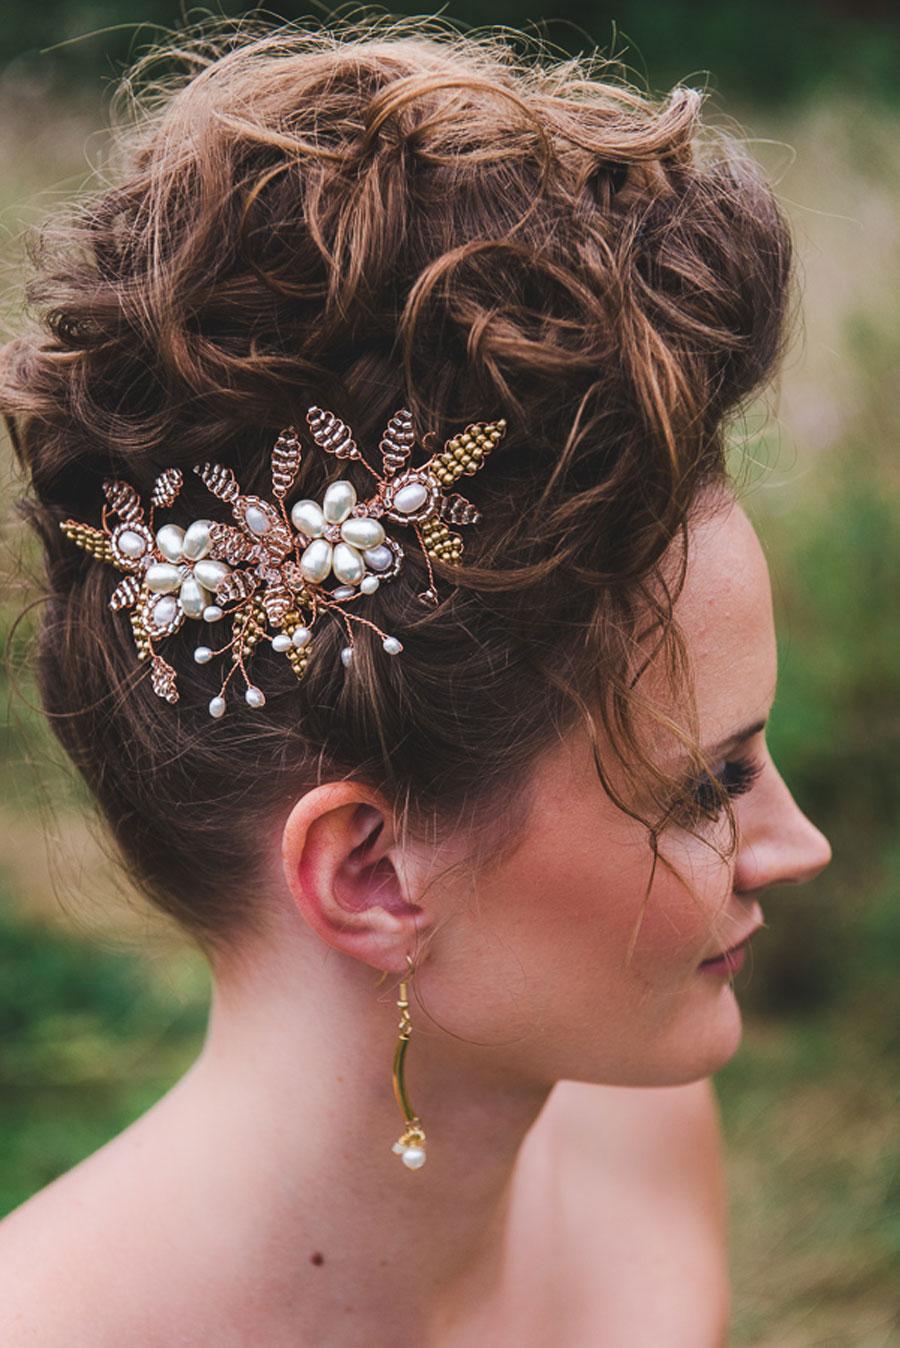 A Late Summer Renaissance-Meets-Fantasy Themed Bridal Shoot0061